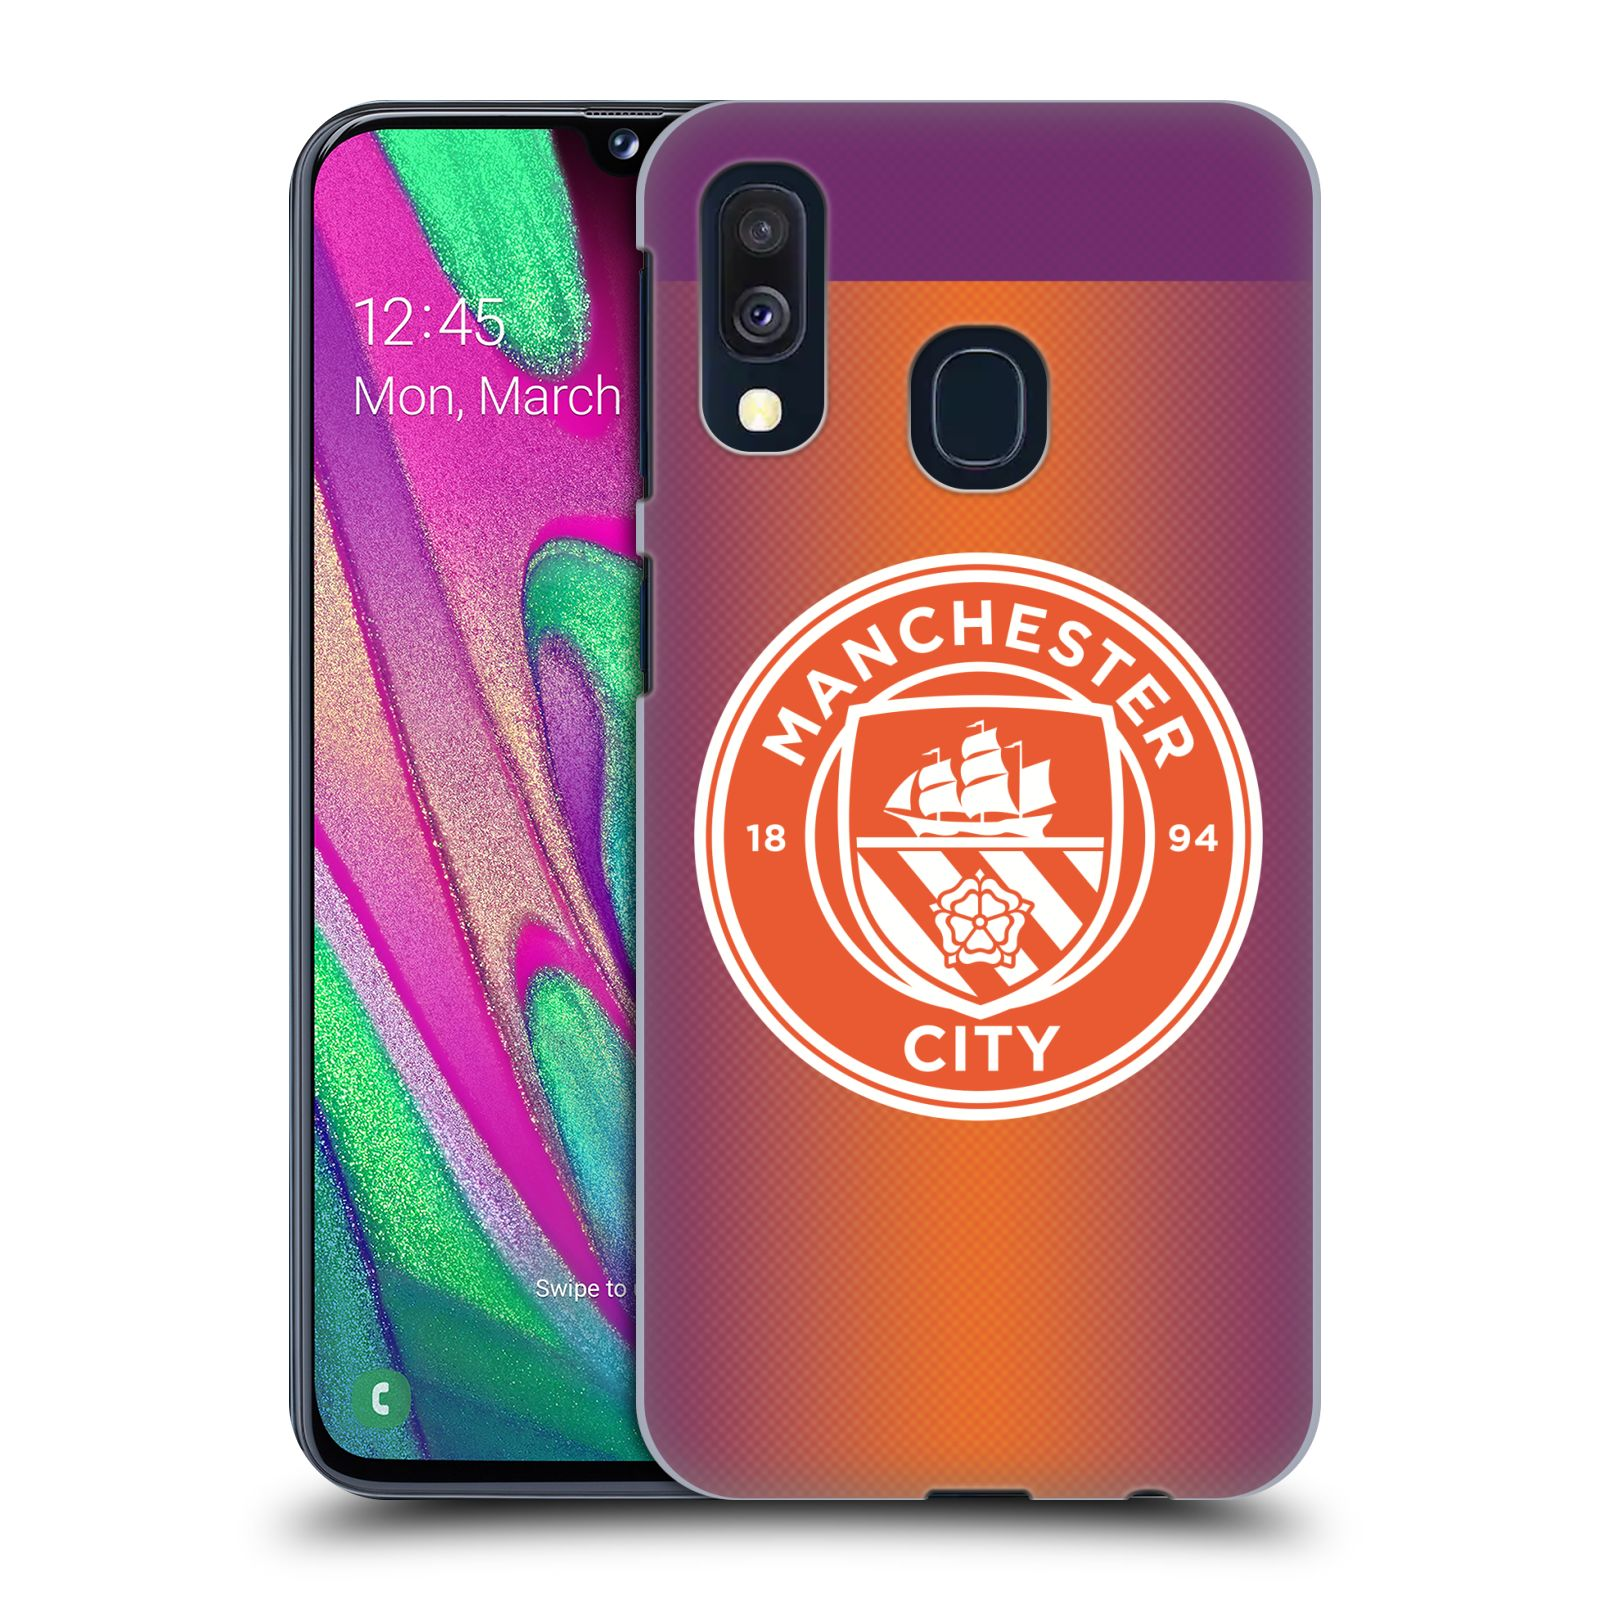 Plastové pouzdro na mobil Samsung Galaxy A40 - Head Case - Manchester City FC - Oranžové nové logo